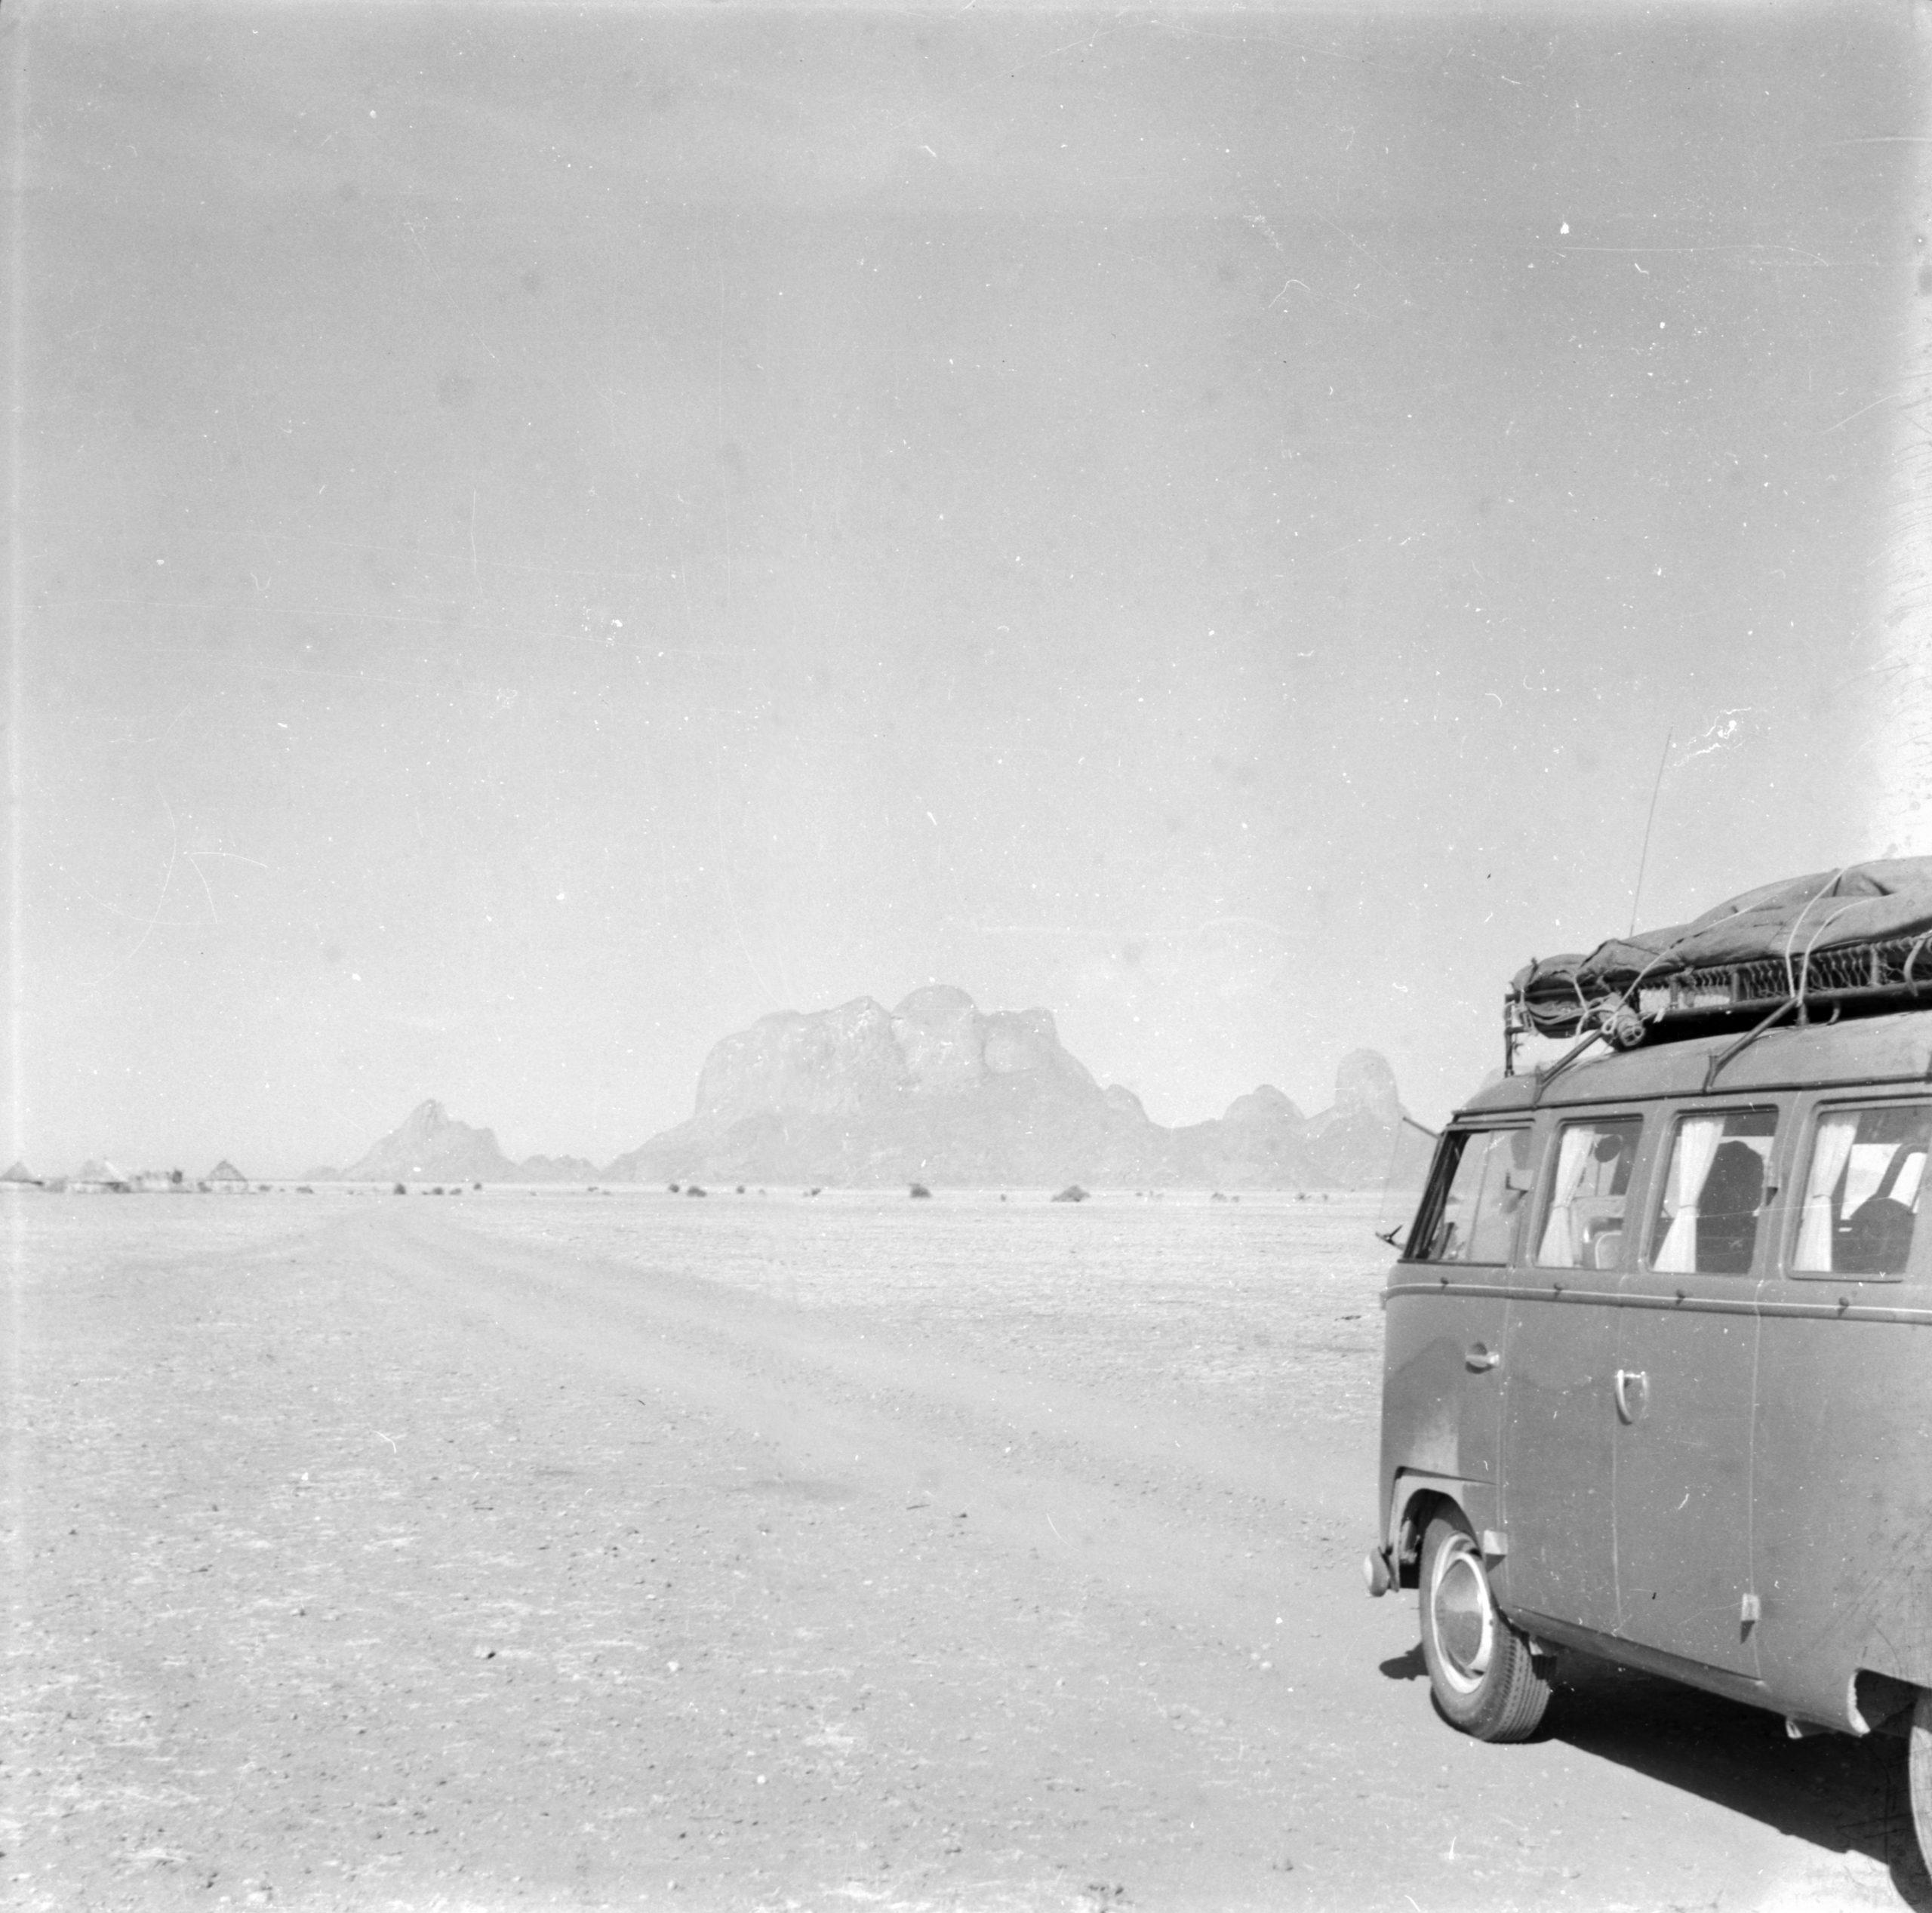 Home is a Journey - Feb 21 - Sudan landscape